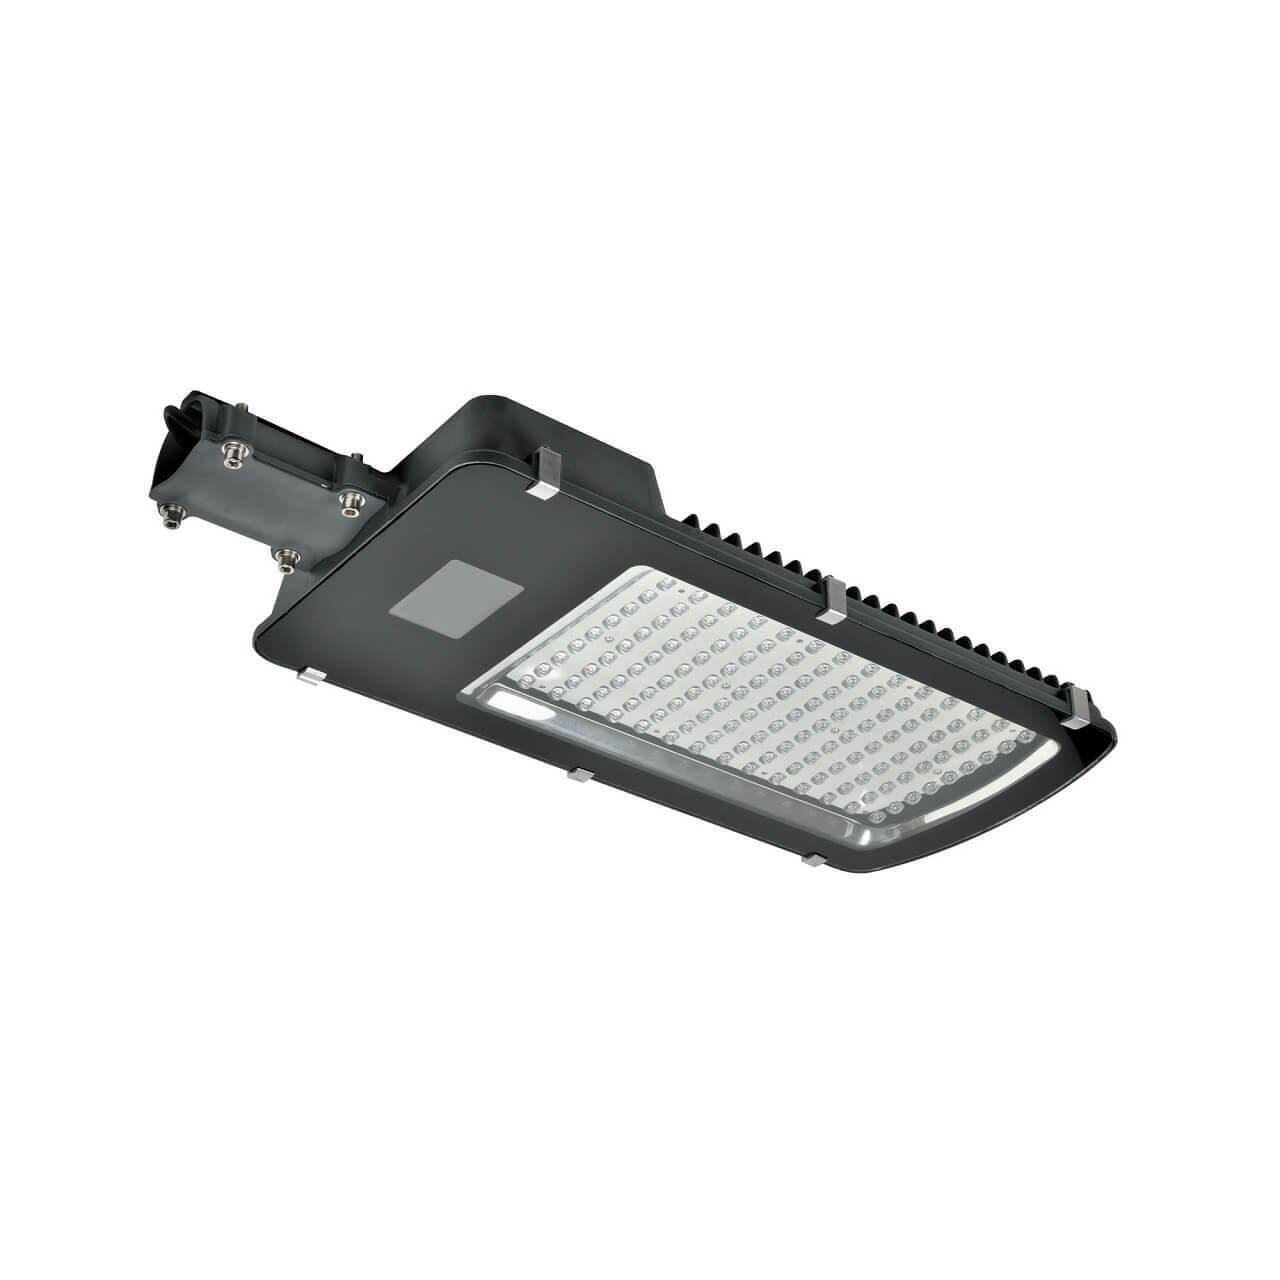 Светильник Uniel ULV-R22H-70W/DW IP65 Grey ULV-R22 уличный светодиодный светильник ul 00003301 uniel ulg r001 020 rgb ip65 ball